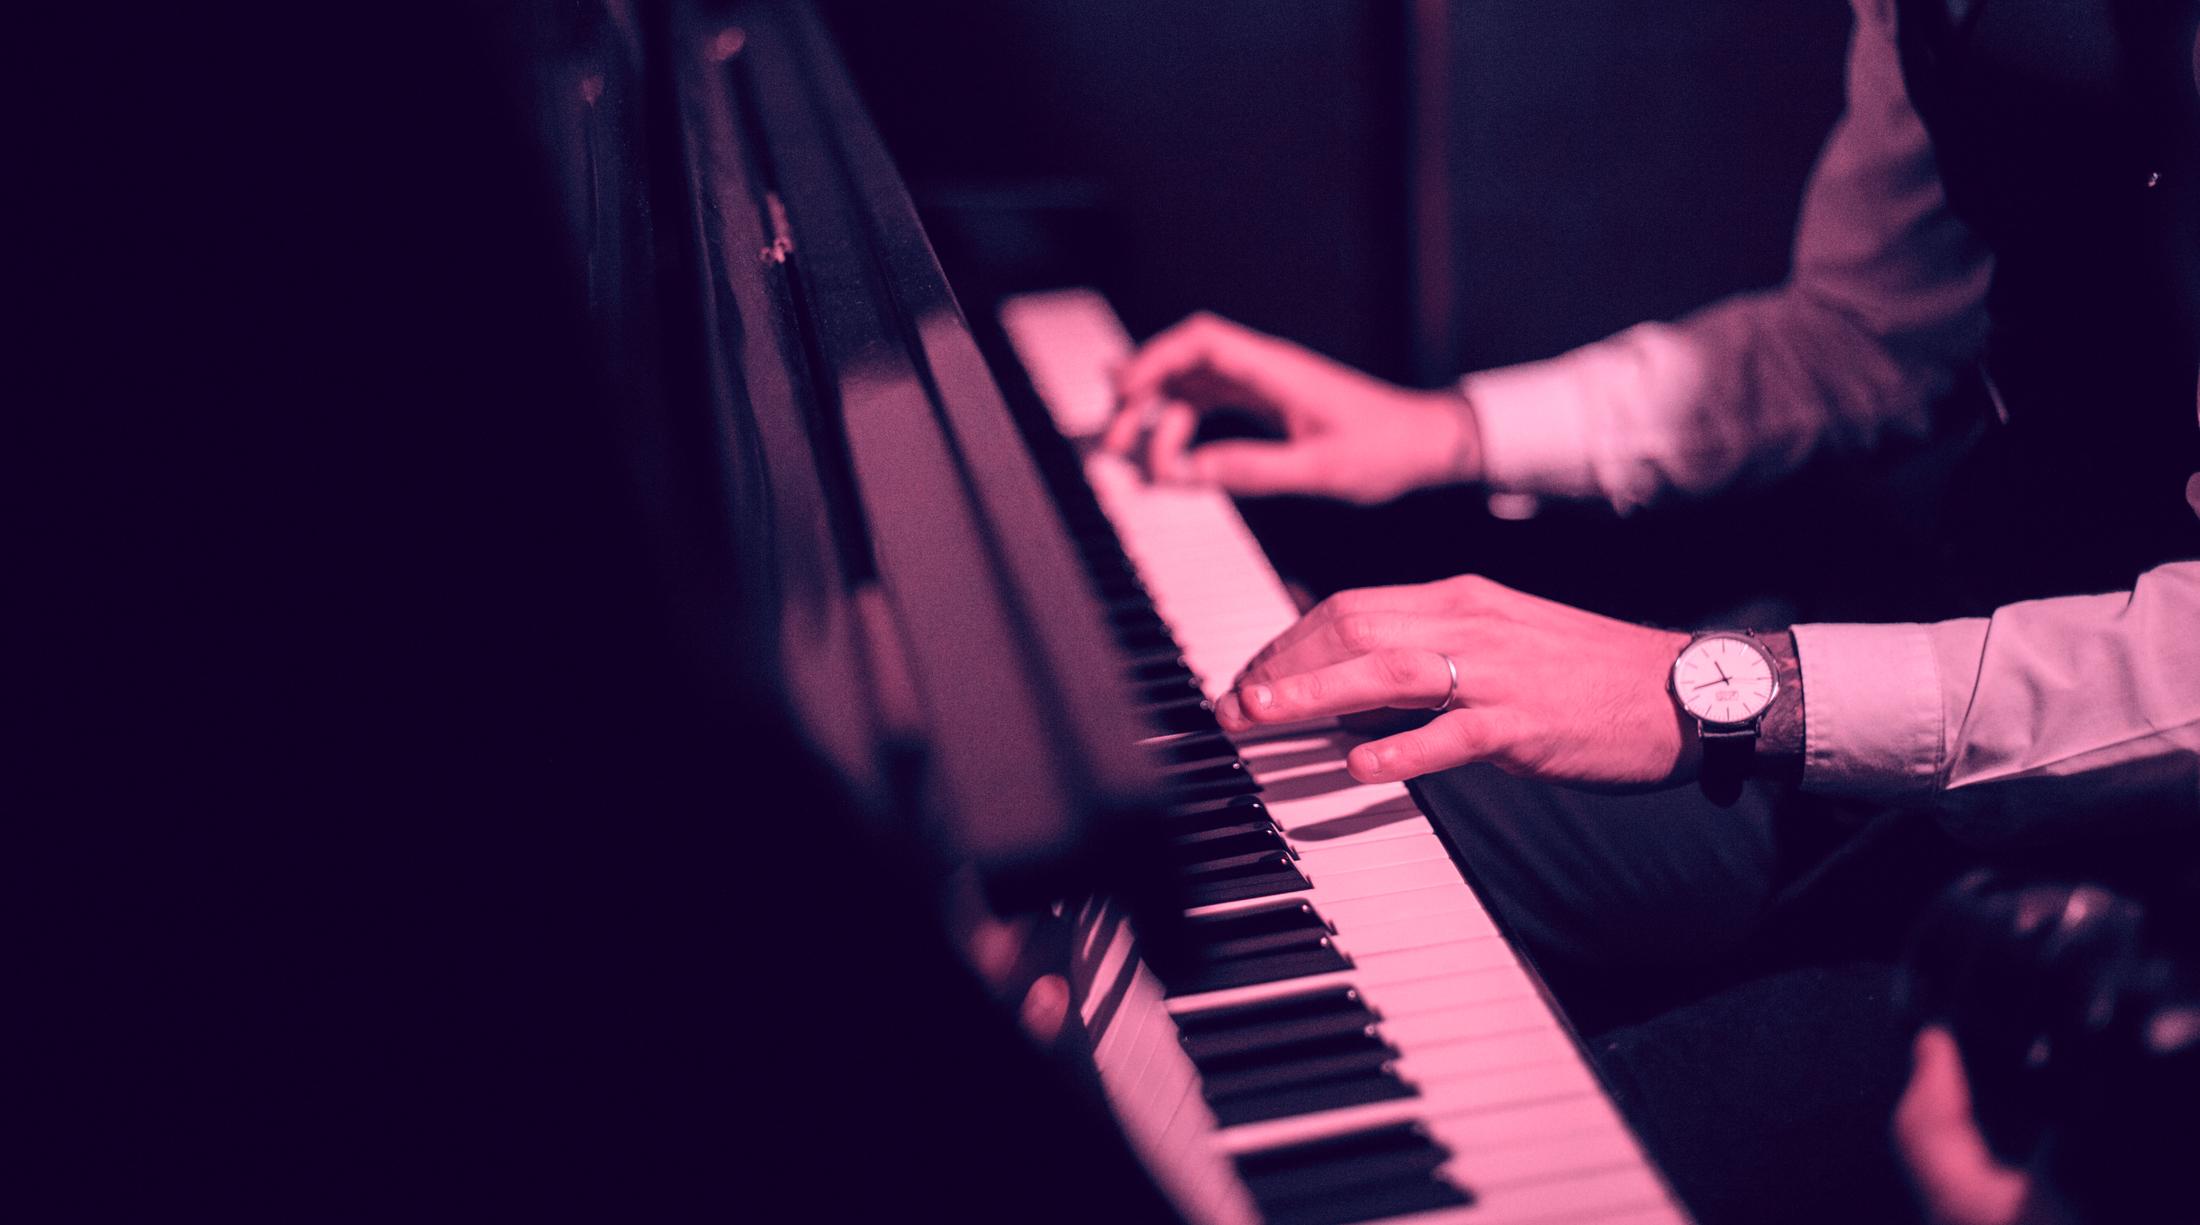 bg-piano-v3.jpg